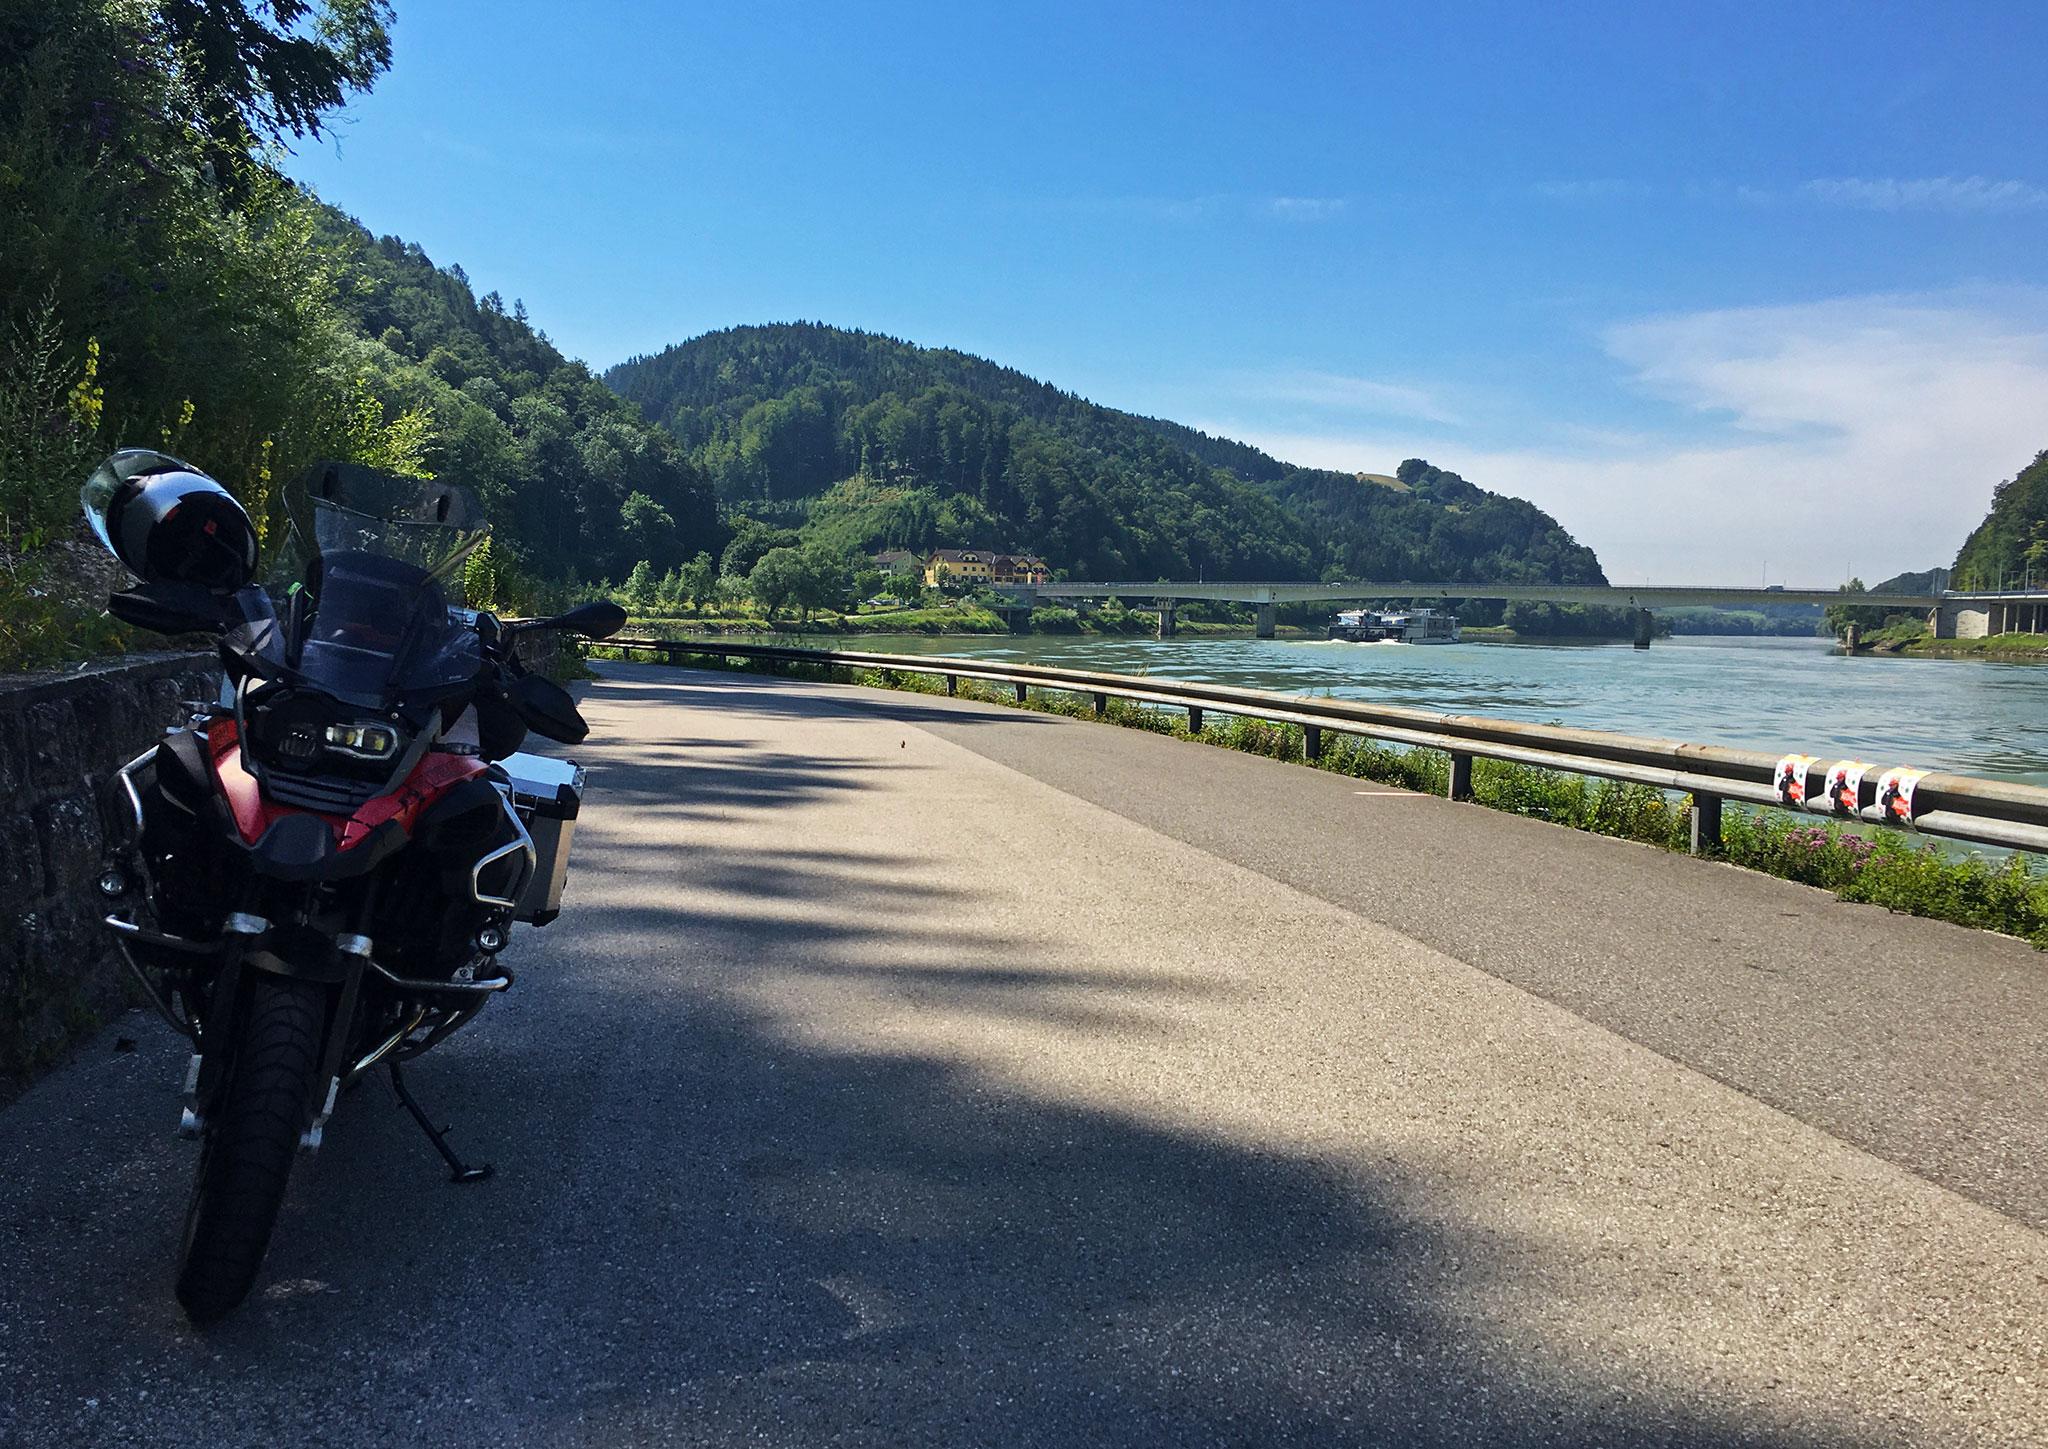 By the Danube river, dividing Upper & Lower Austrua